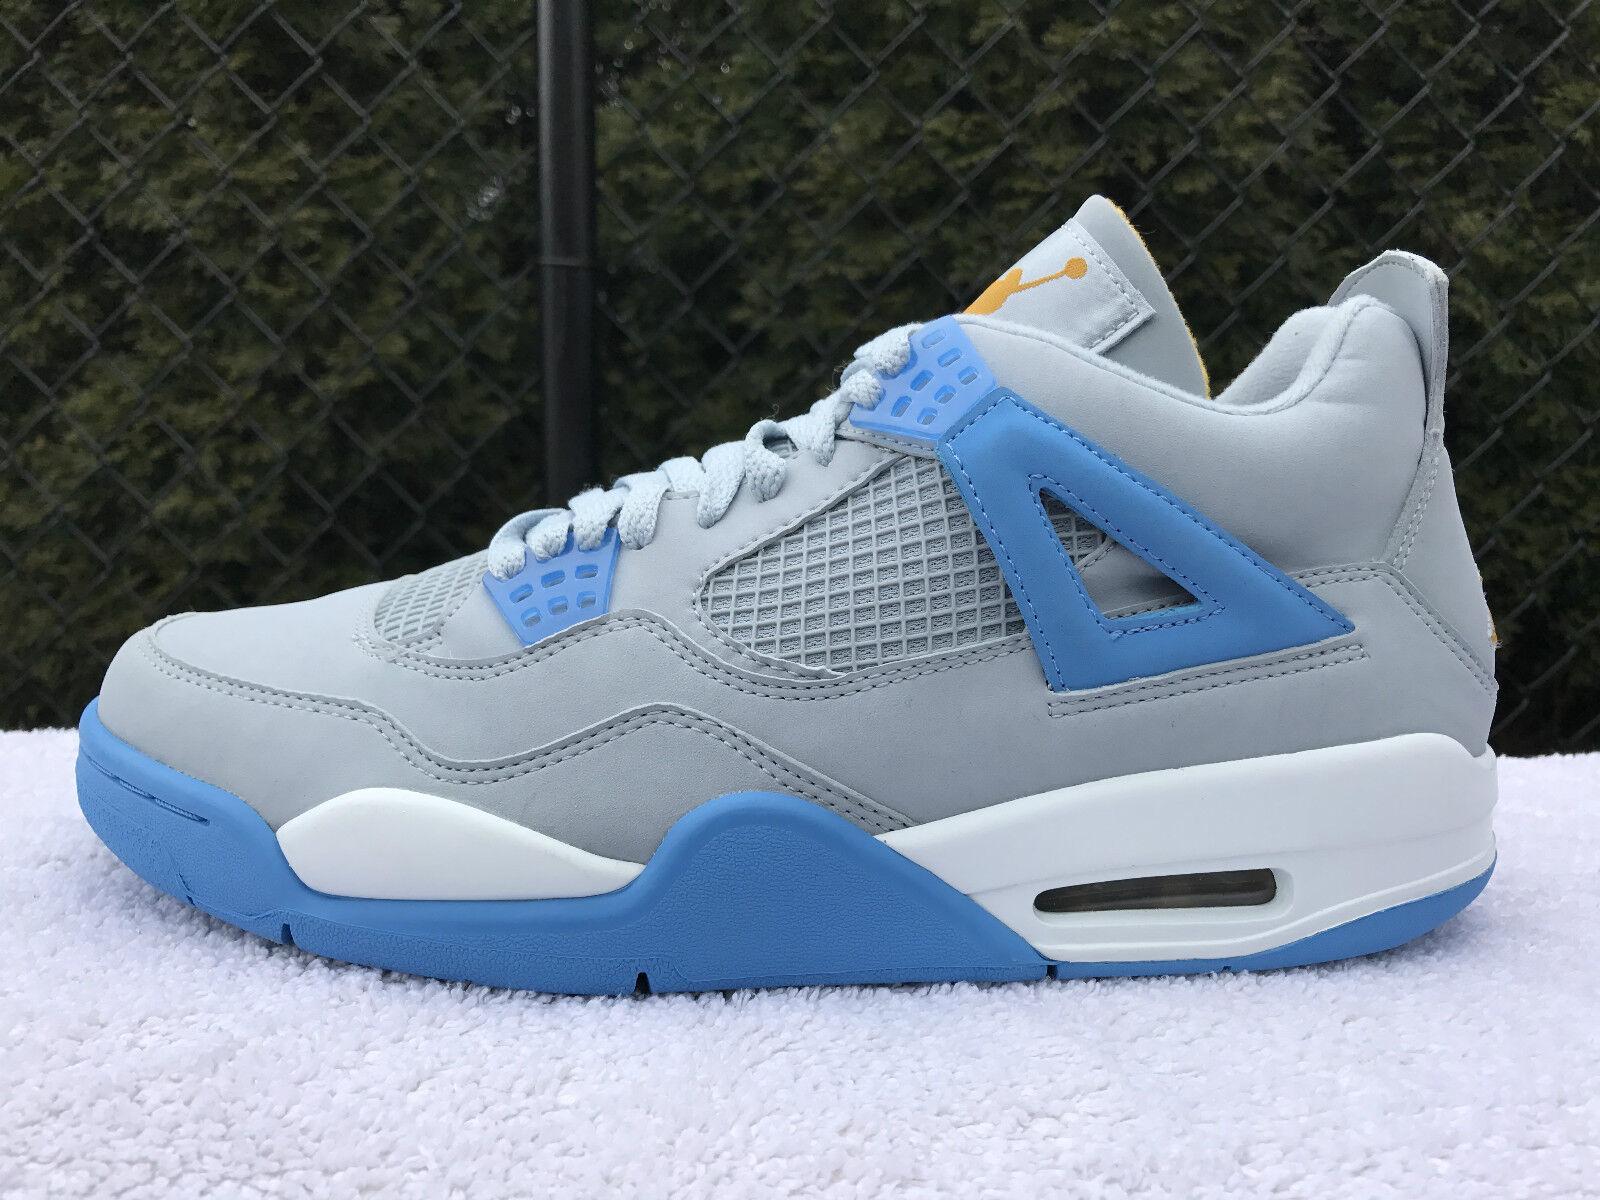 Nike Air Jordan Retro IV 4 LS (314254-041) Mist Blue Size 10.5 (314254-041) LS Deadstock 2006 5c0a46